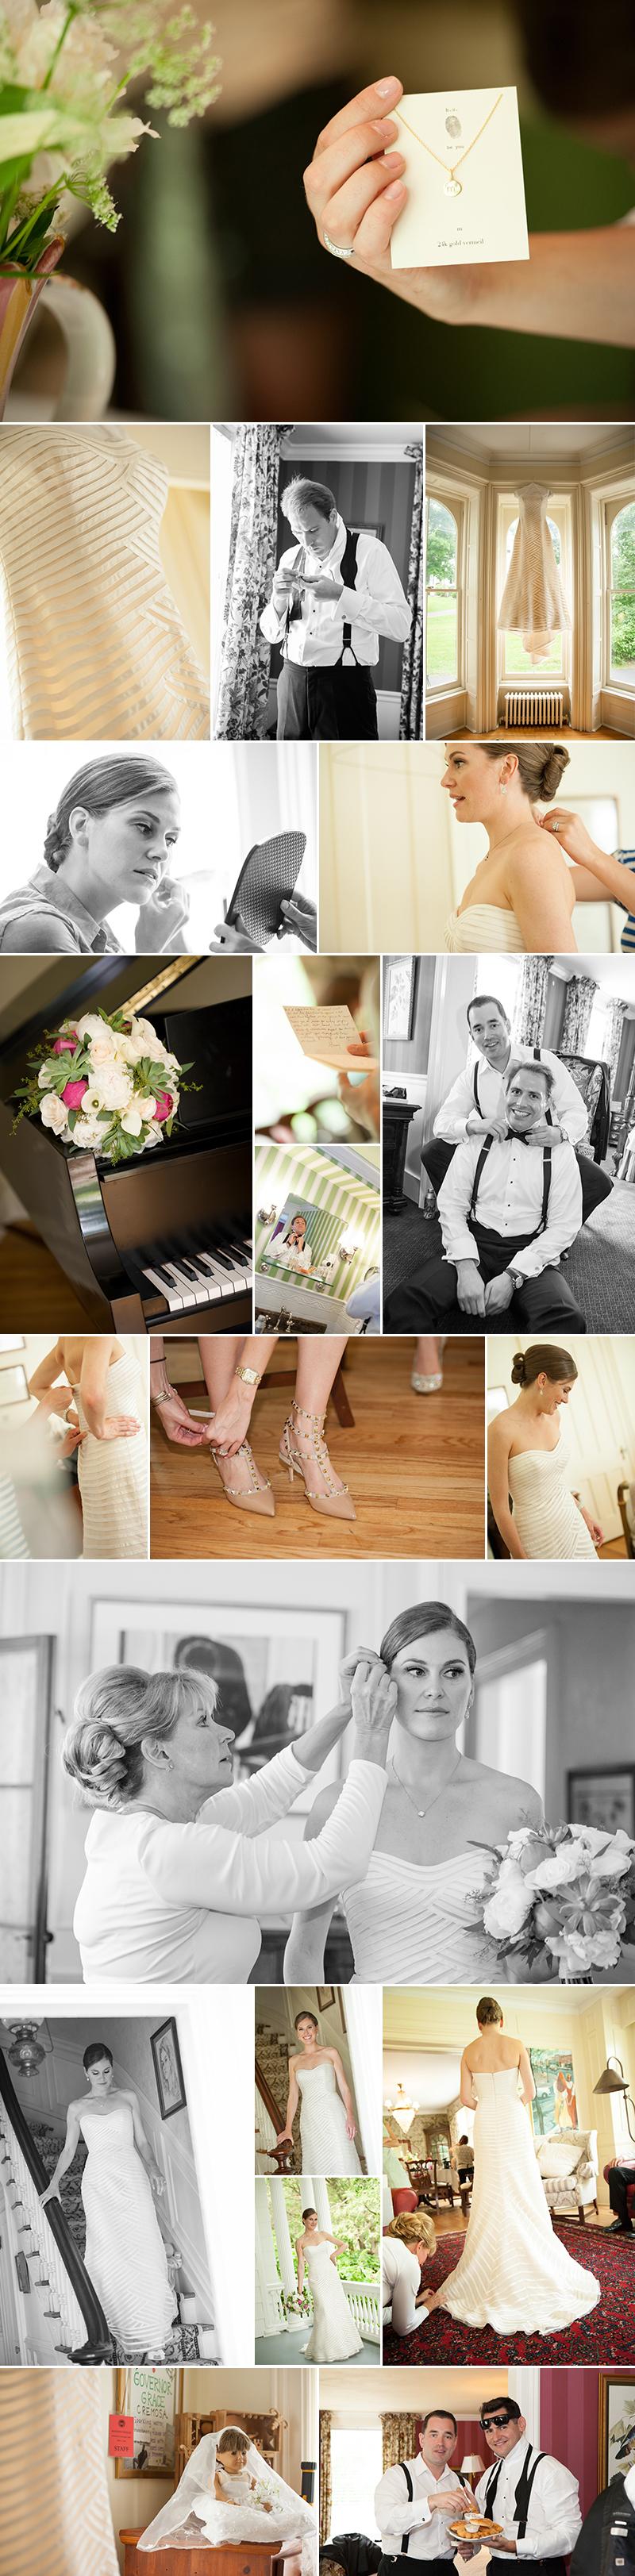 Blog Collage-1395513104181